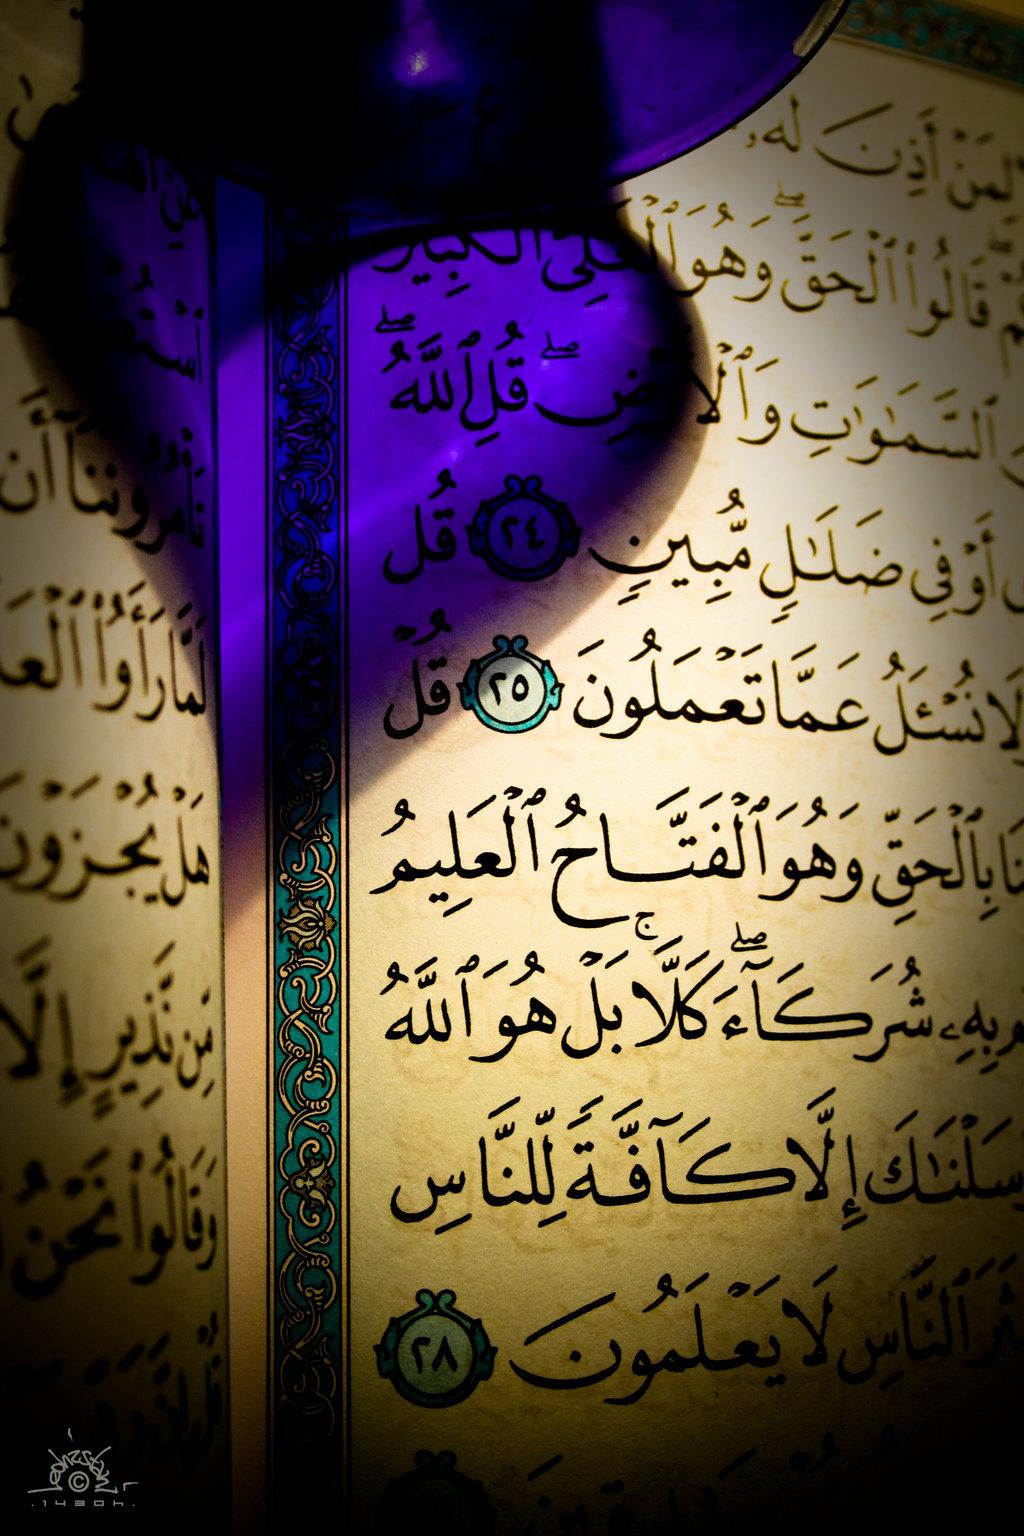 Luv Islam   iluvislamcom inspiring The Ummah   HD Wallpapers 1024x1536